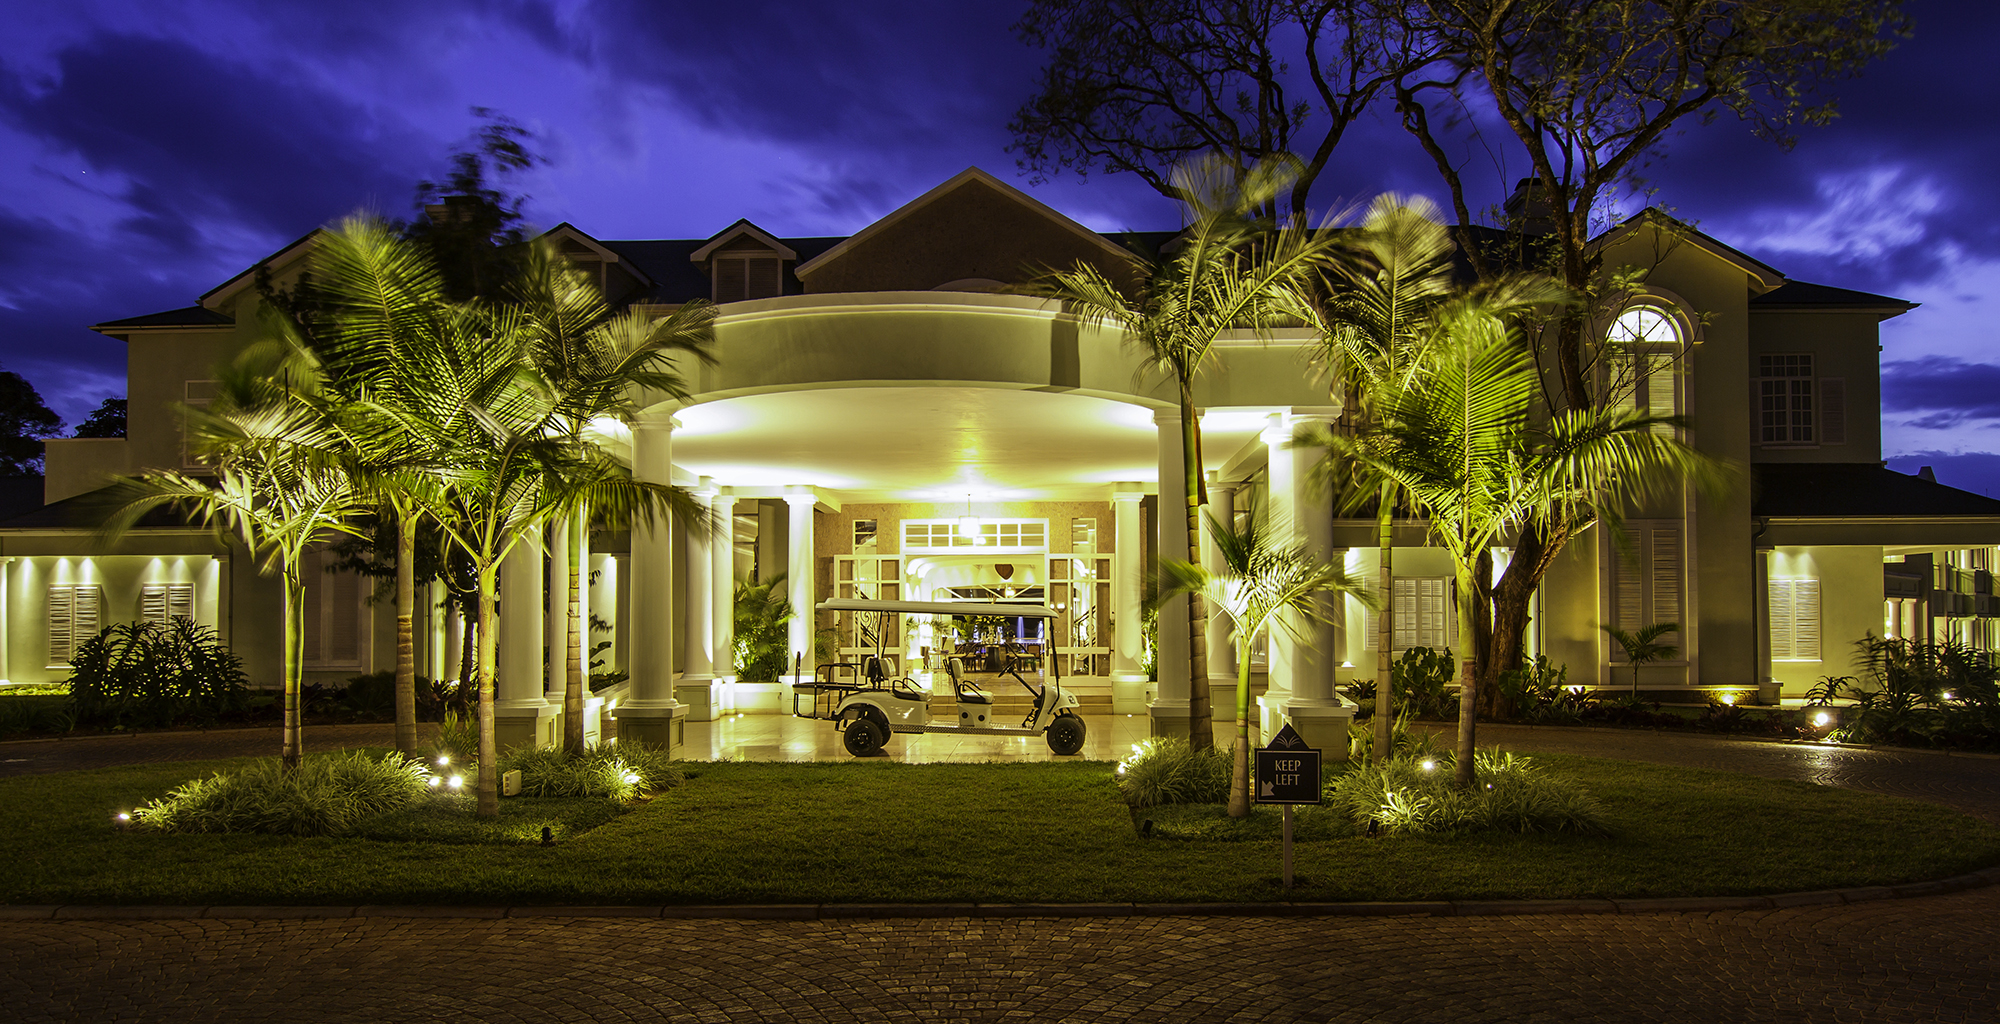 Kenya-Hemingways-Nairobi-Exterior